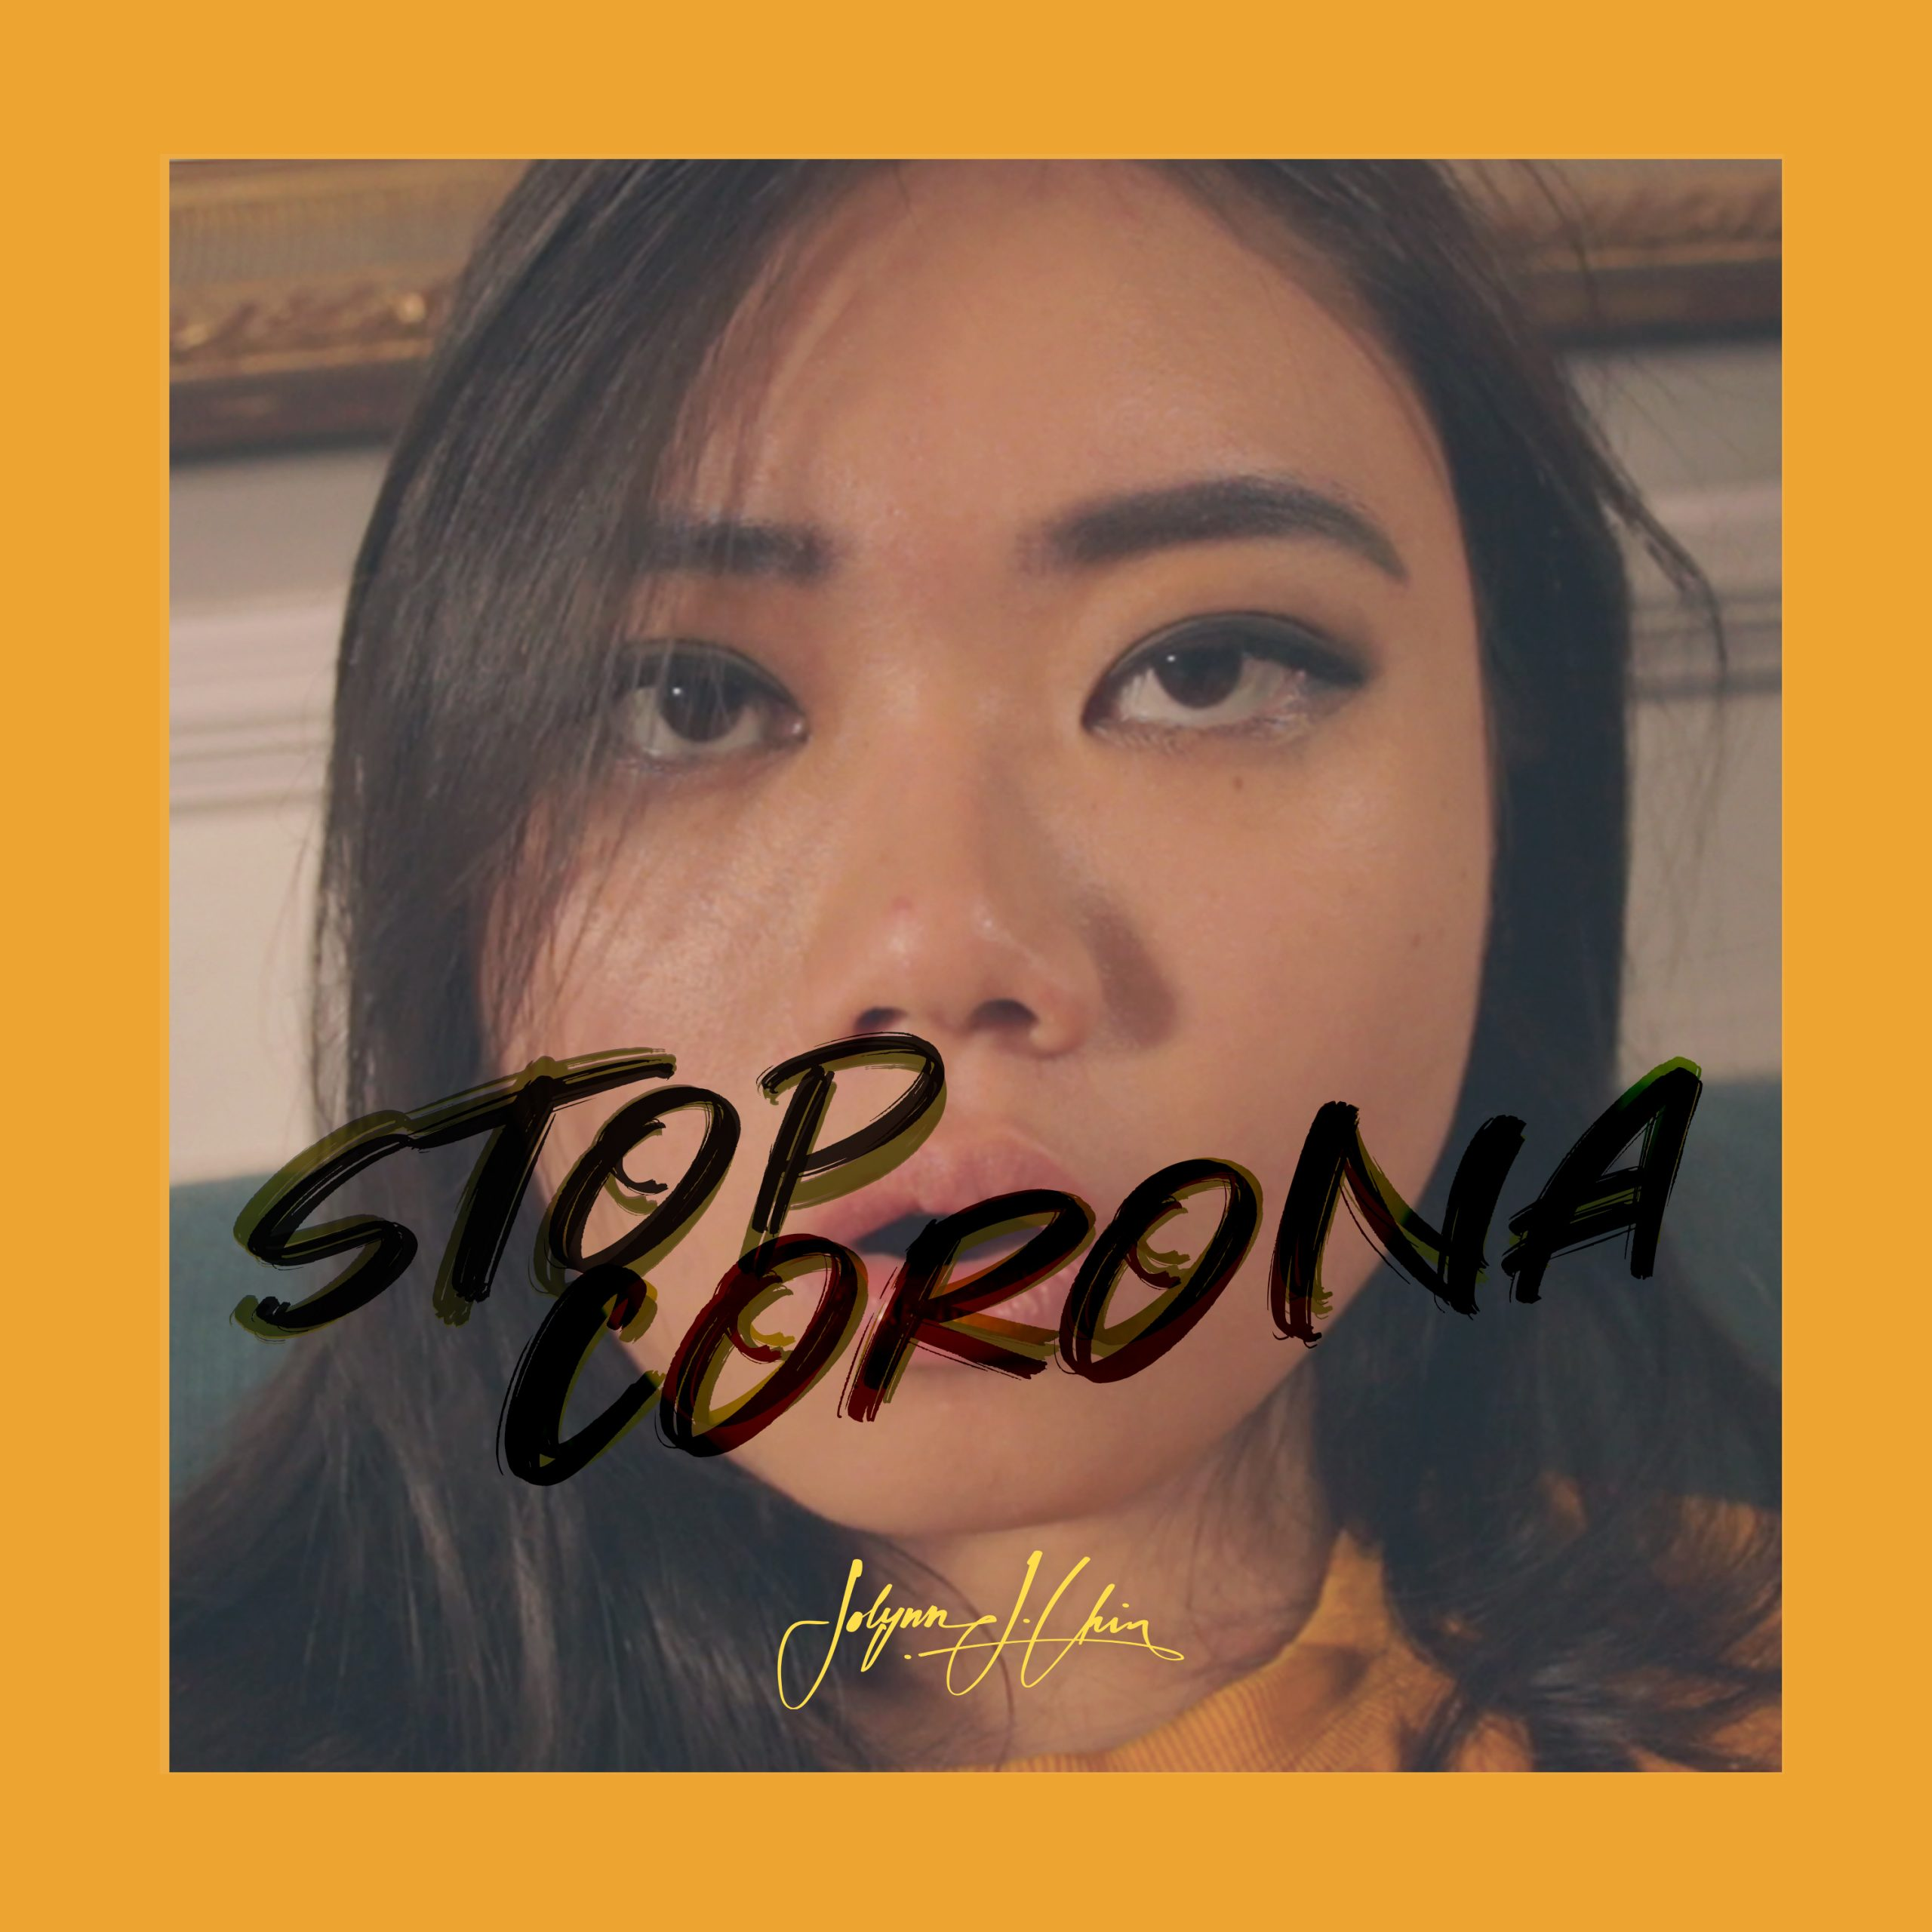 Jolynn J Chin // Stop Corona - single cover